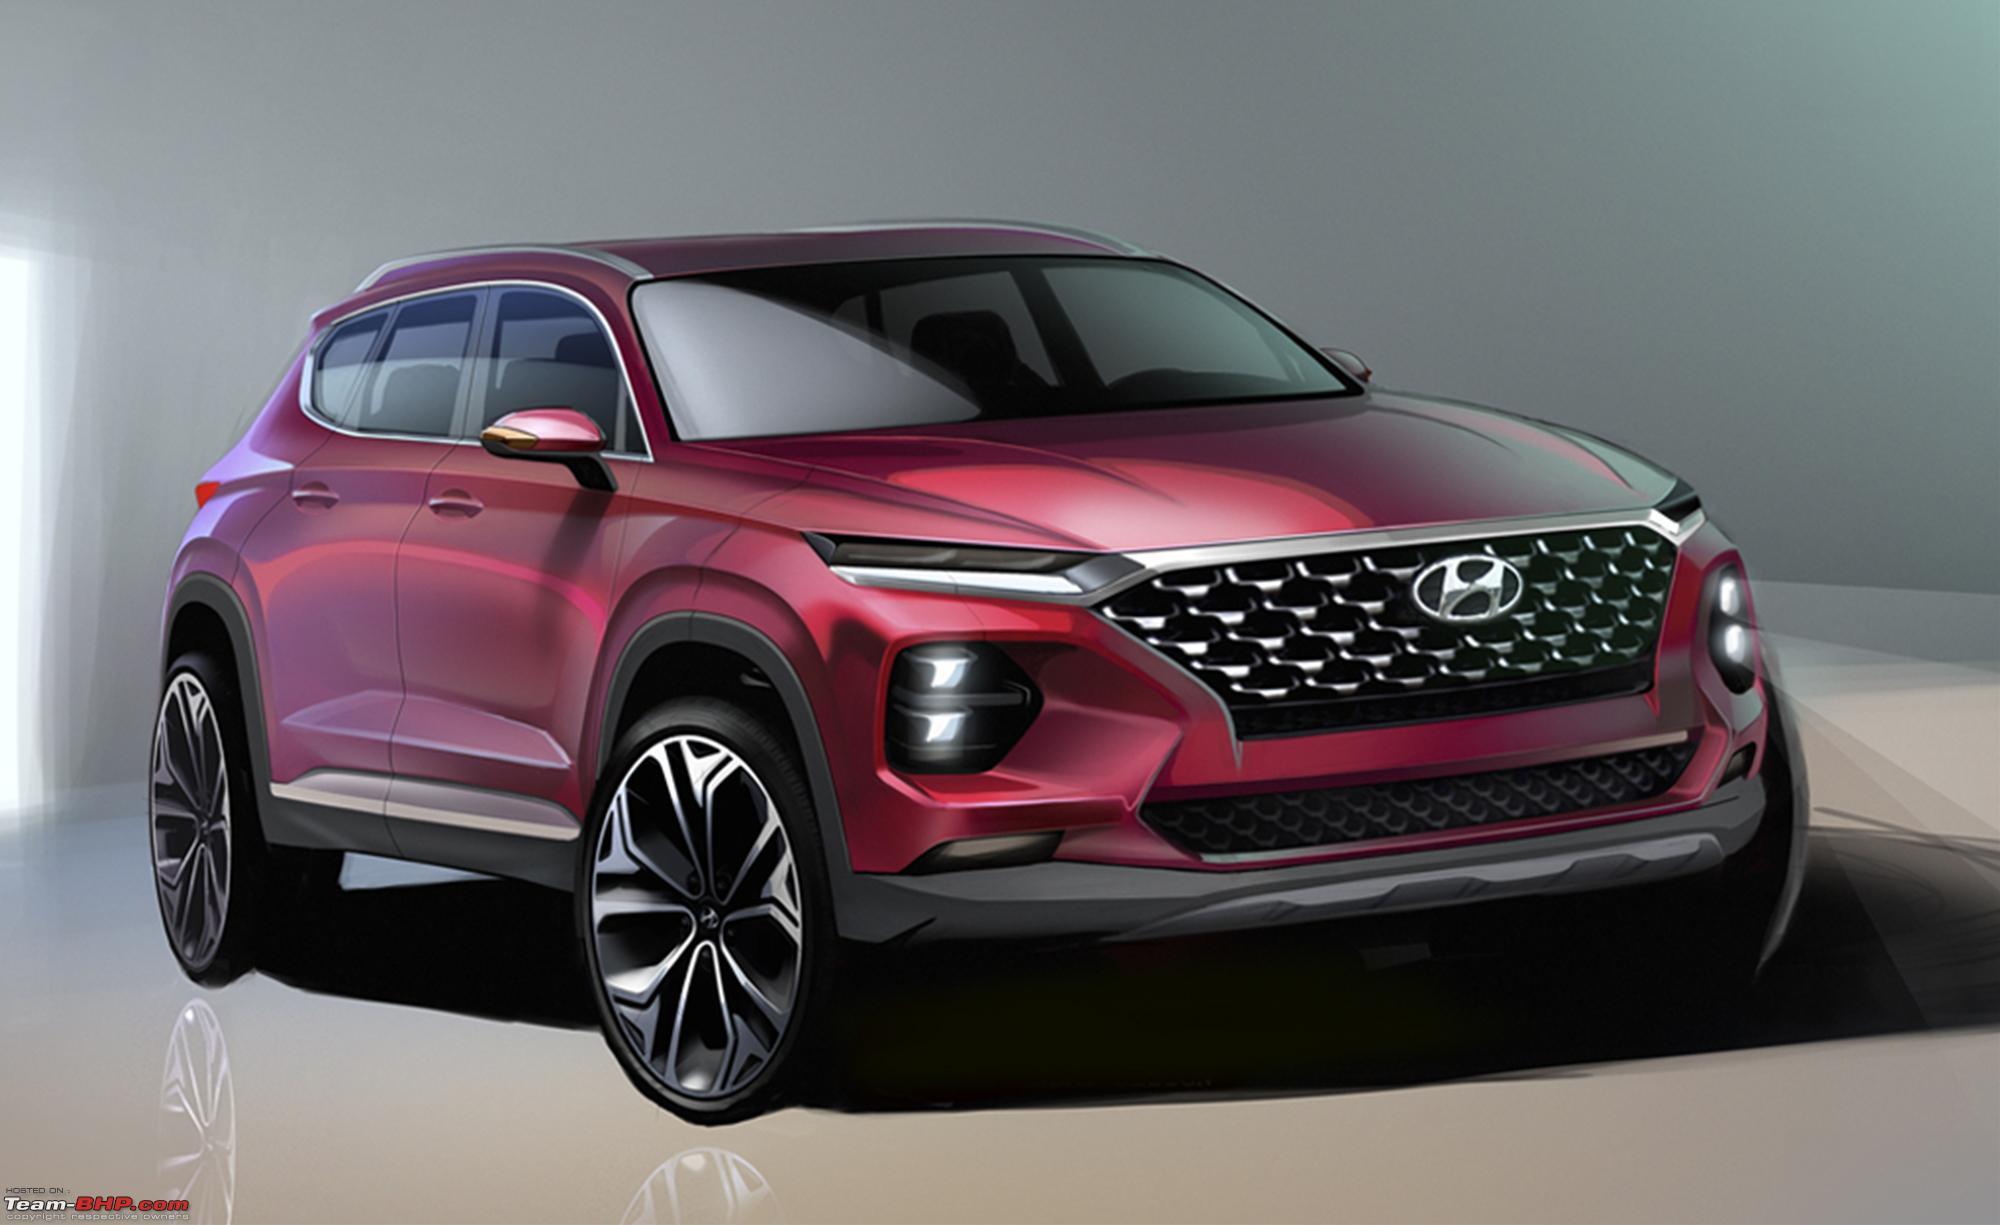 The 4th Gen Hyundai Santa Fe Santa Fe_rendering Image 1.